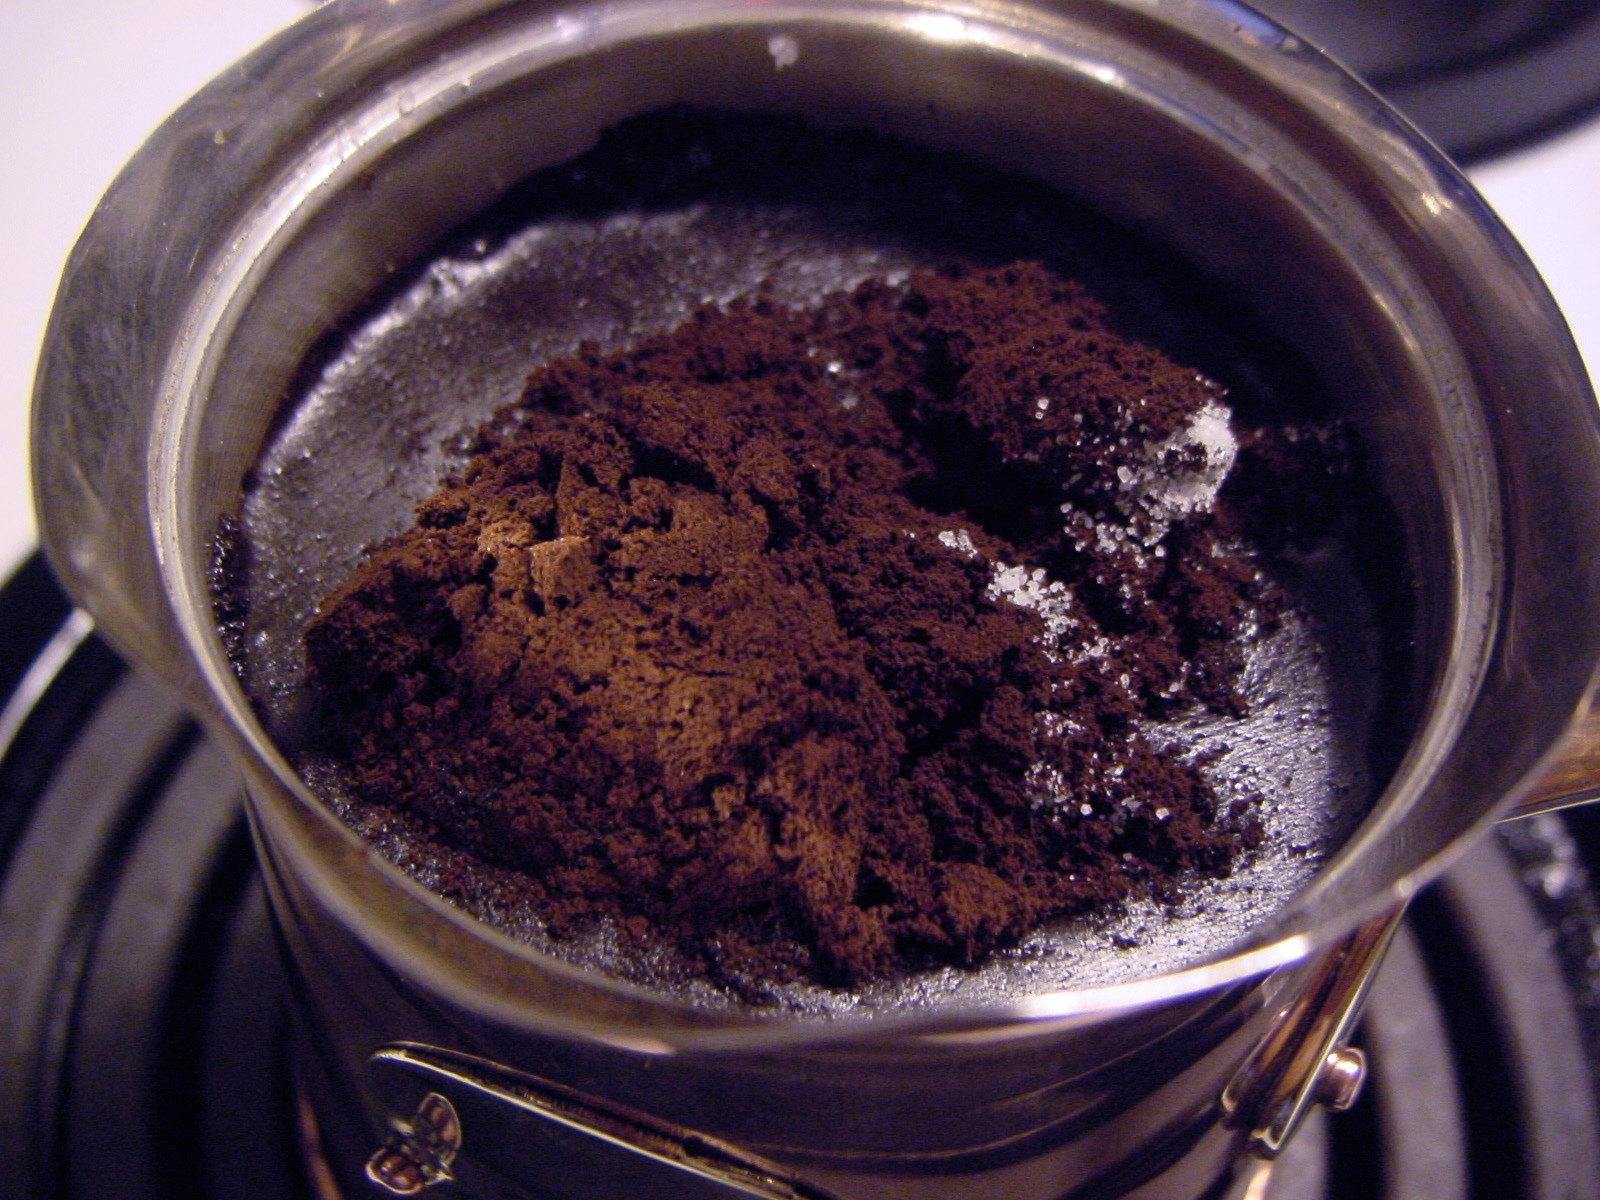 brewing turskish coffee image, brewing turkish coffee photo, brewing turkish coffee picture